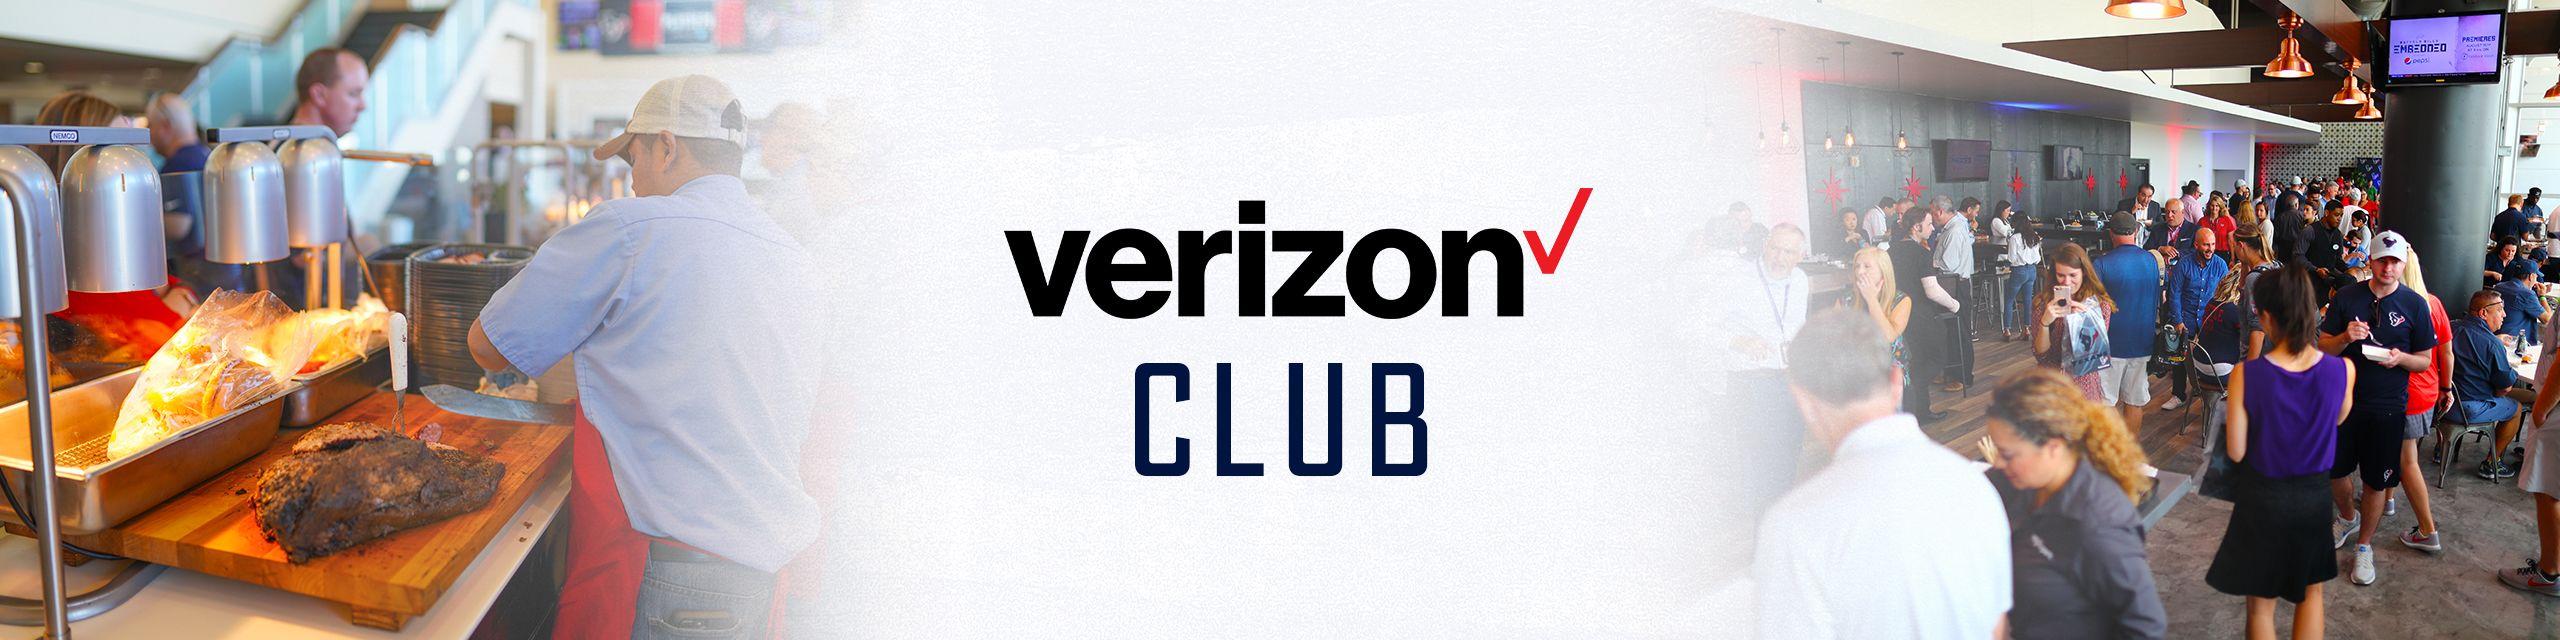 Verizon Club_Hero